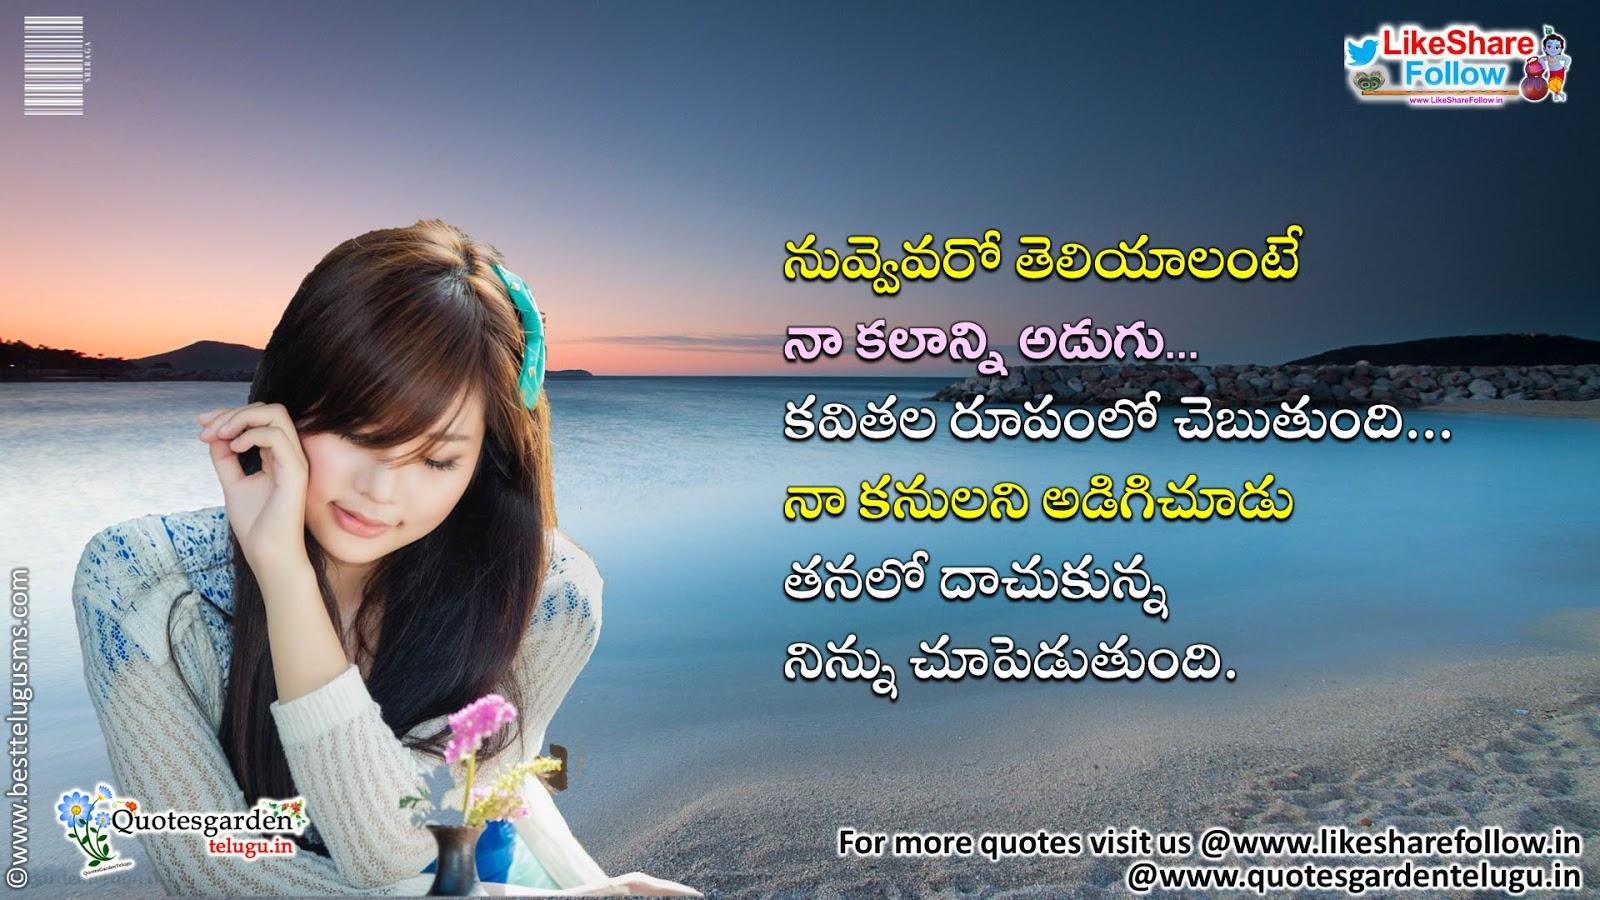 Love Quotes In Telugu Images Download Quotes Garden Telugu Telugu Quotes English Quotes Hindi Quotes